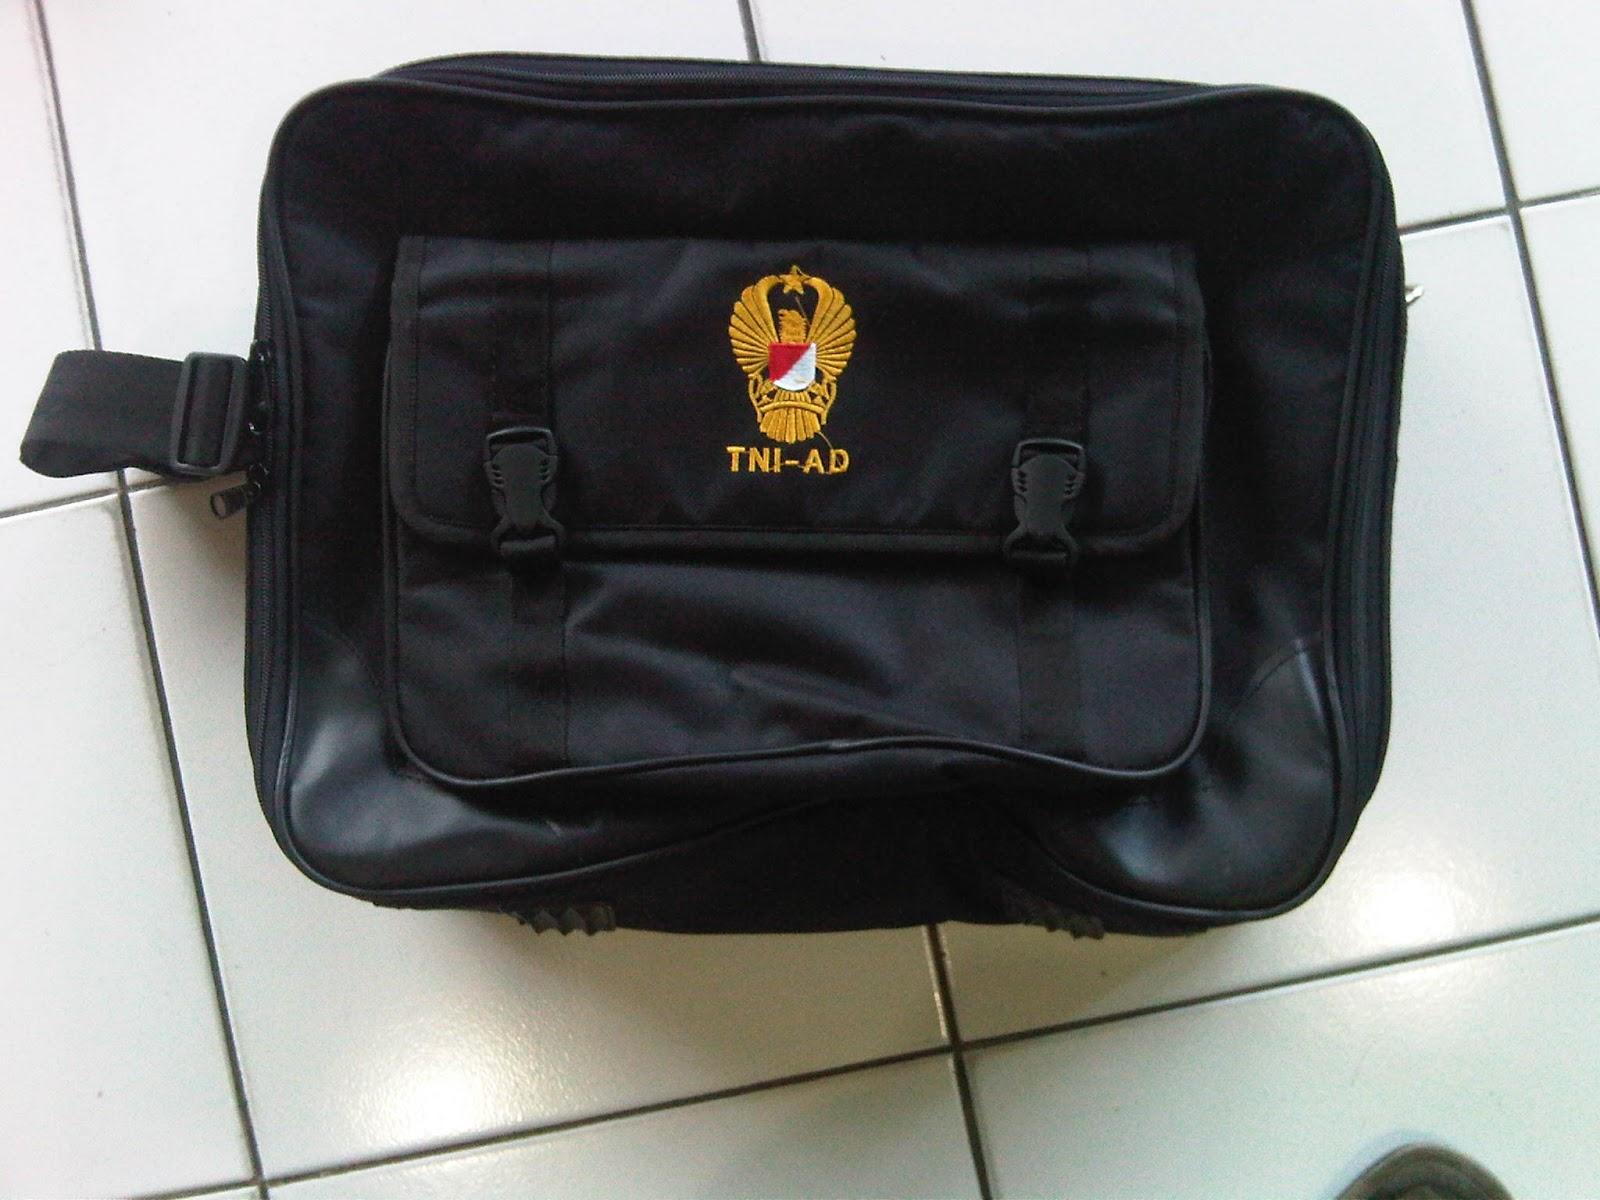 Harga Jual Tas Ransel Polo Yogyakarta